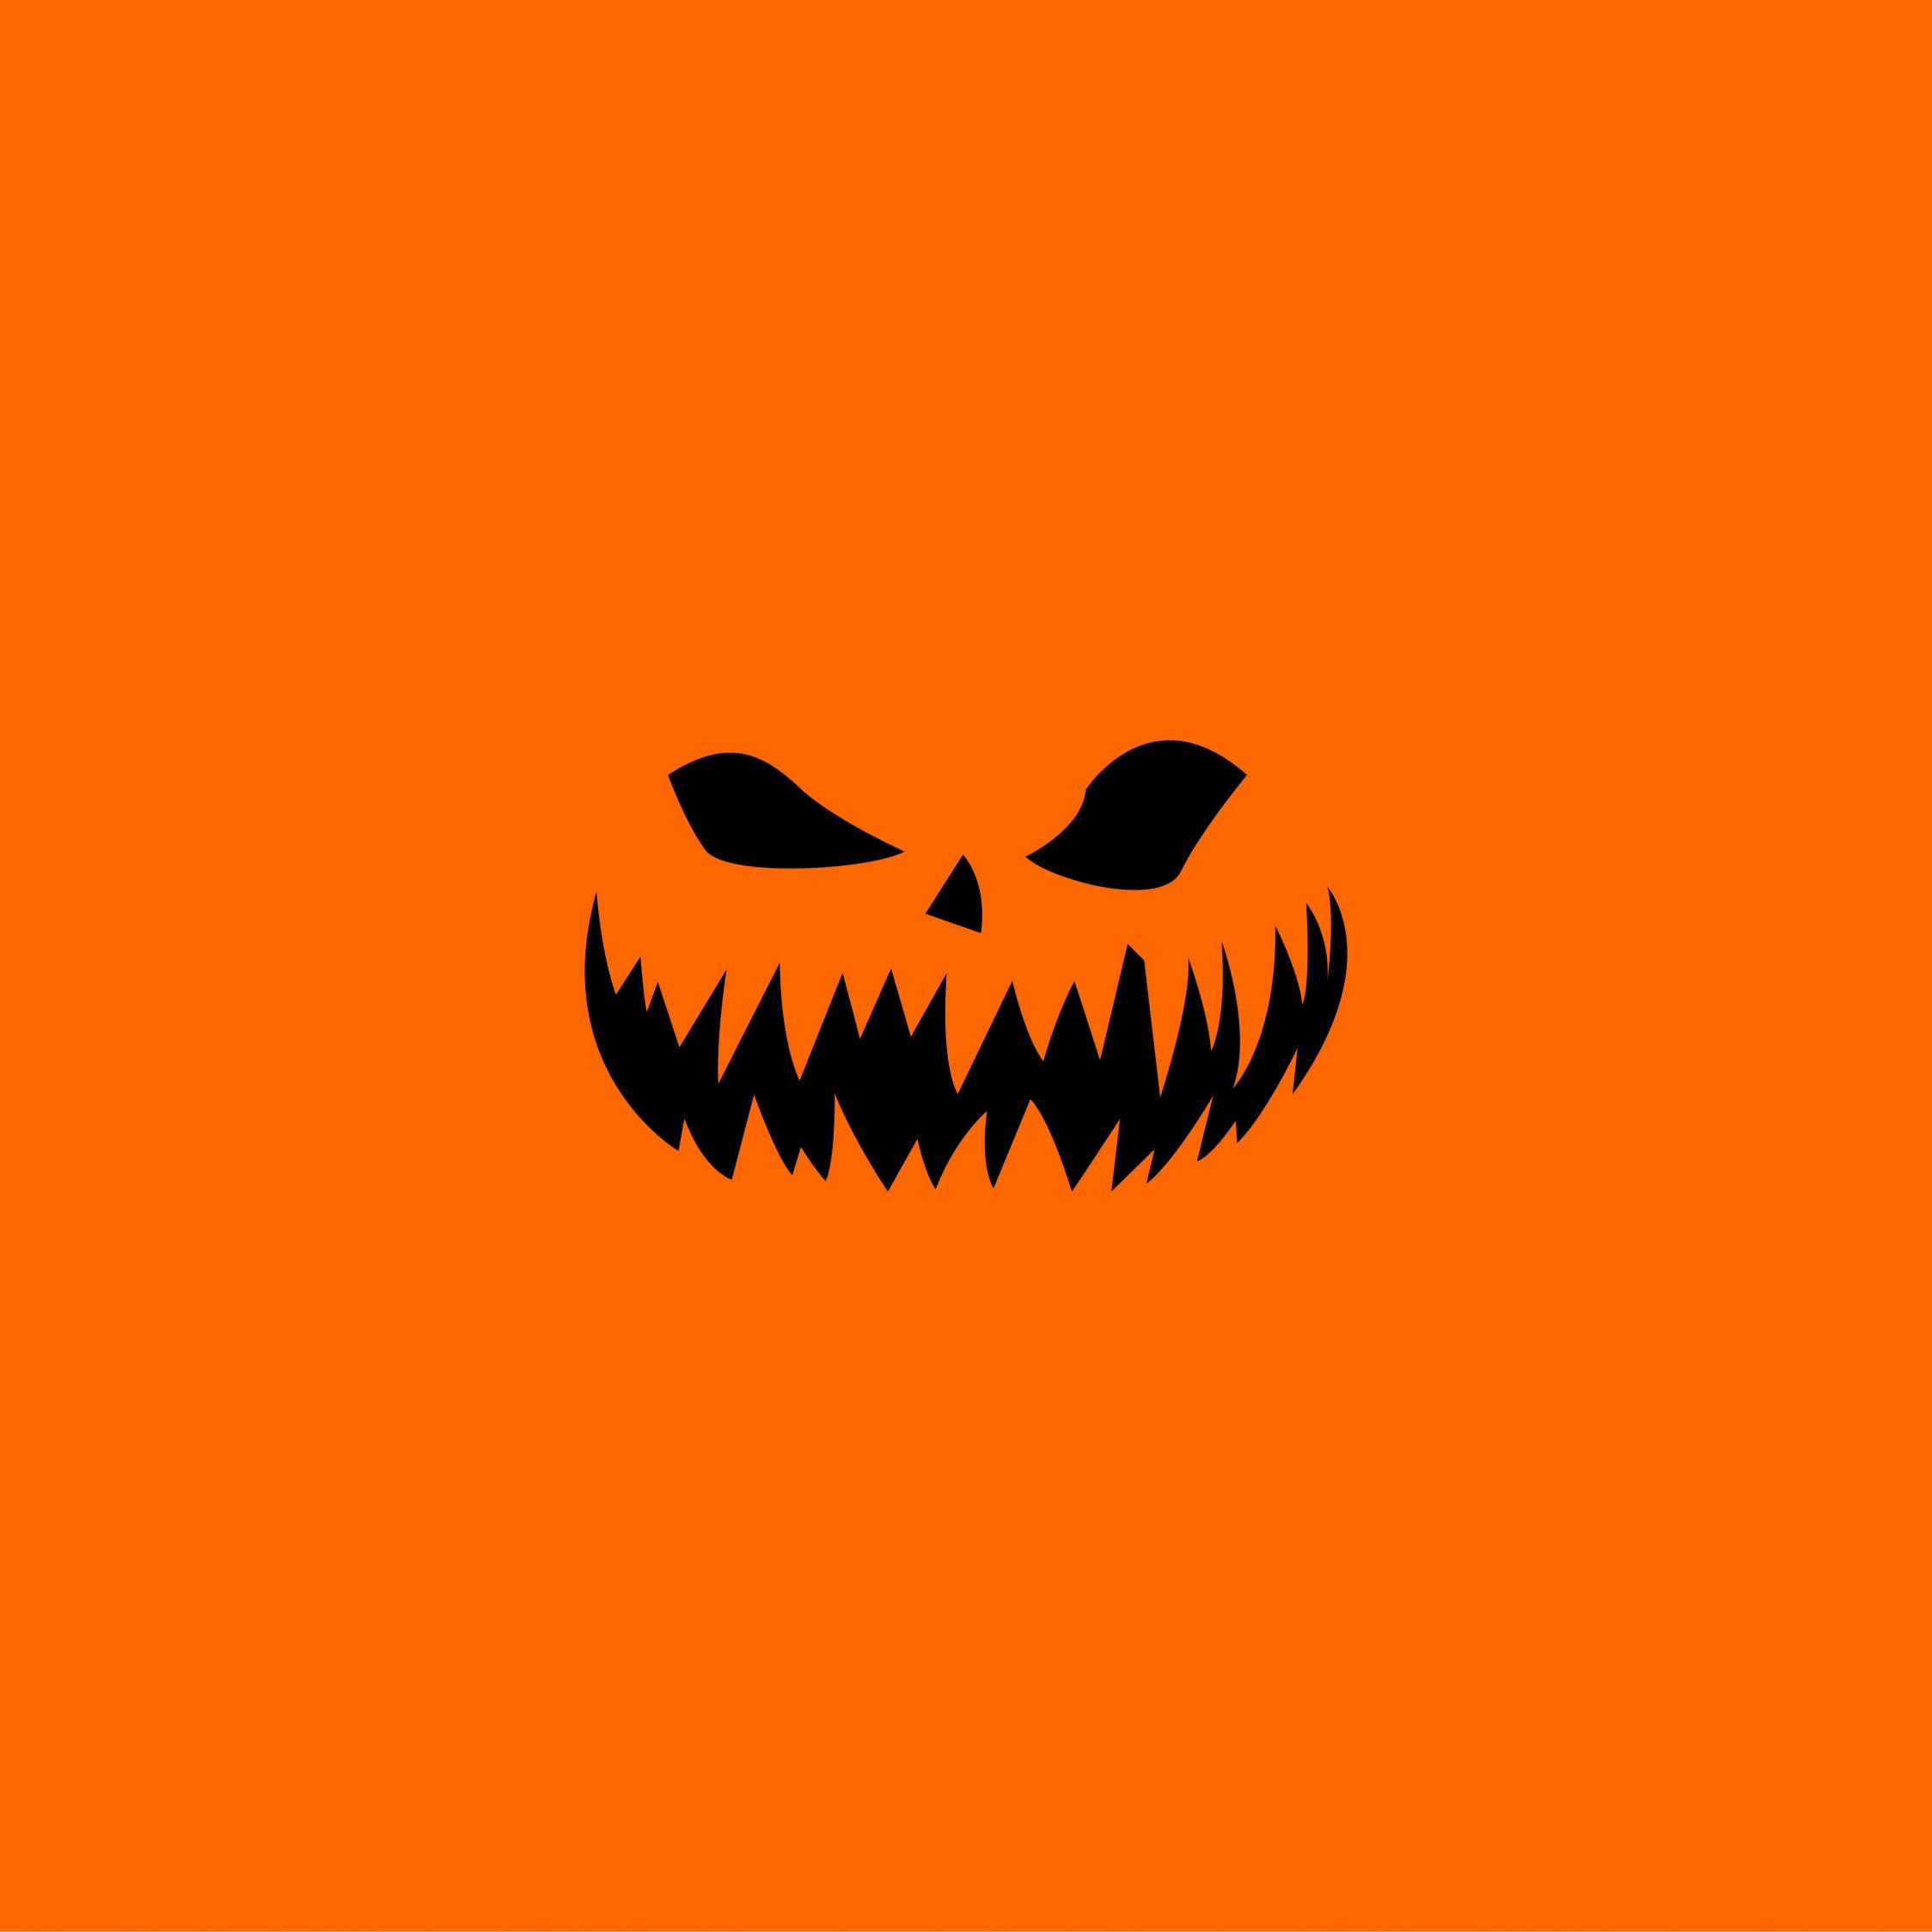 Download 2248x2248 Wallpaper Halloween Minimal Ipad Air